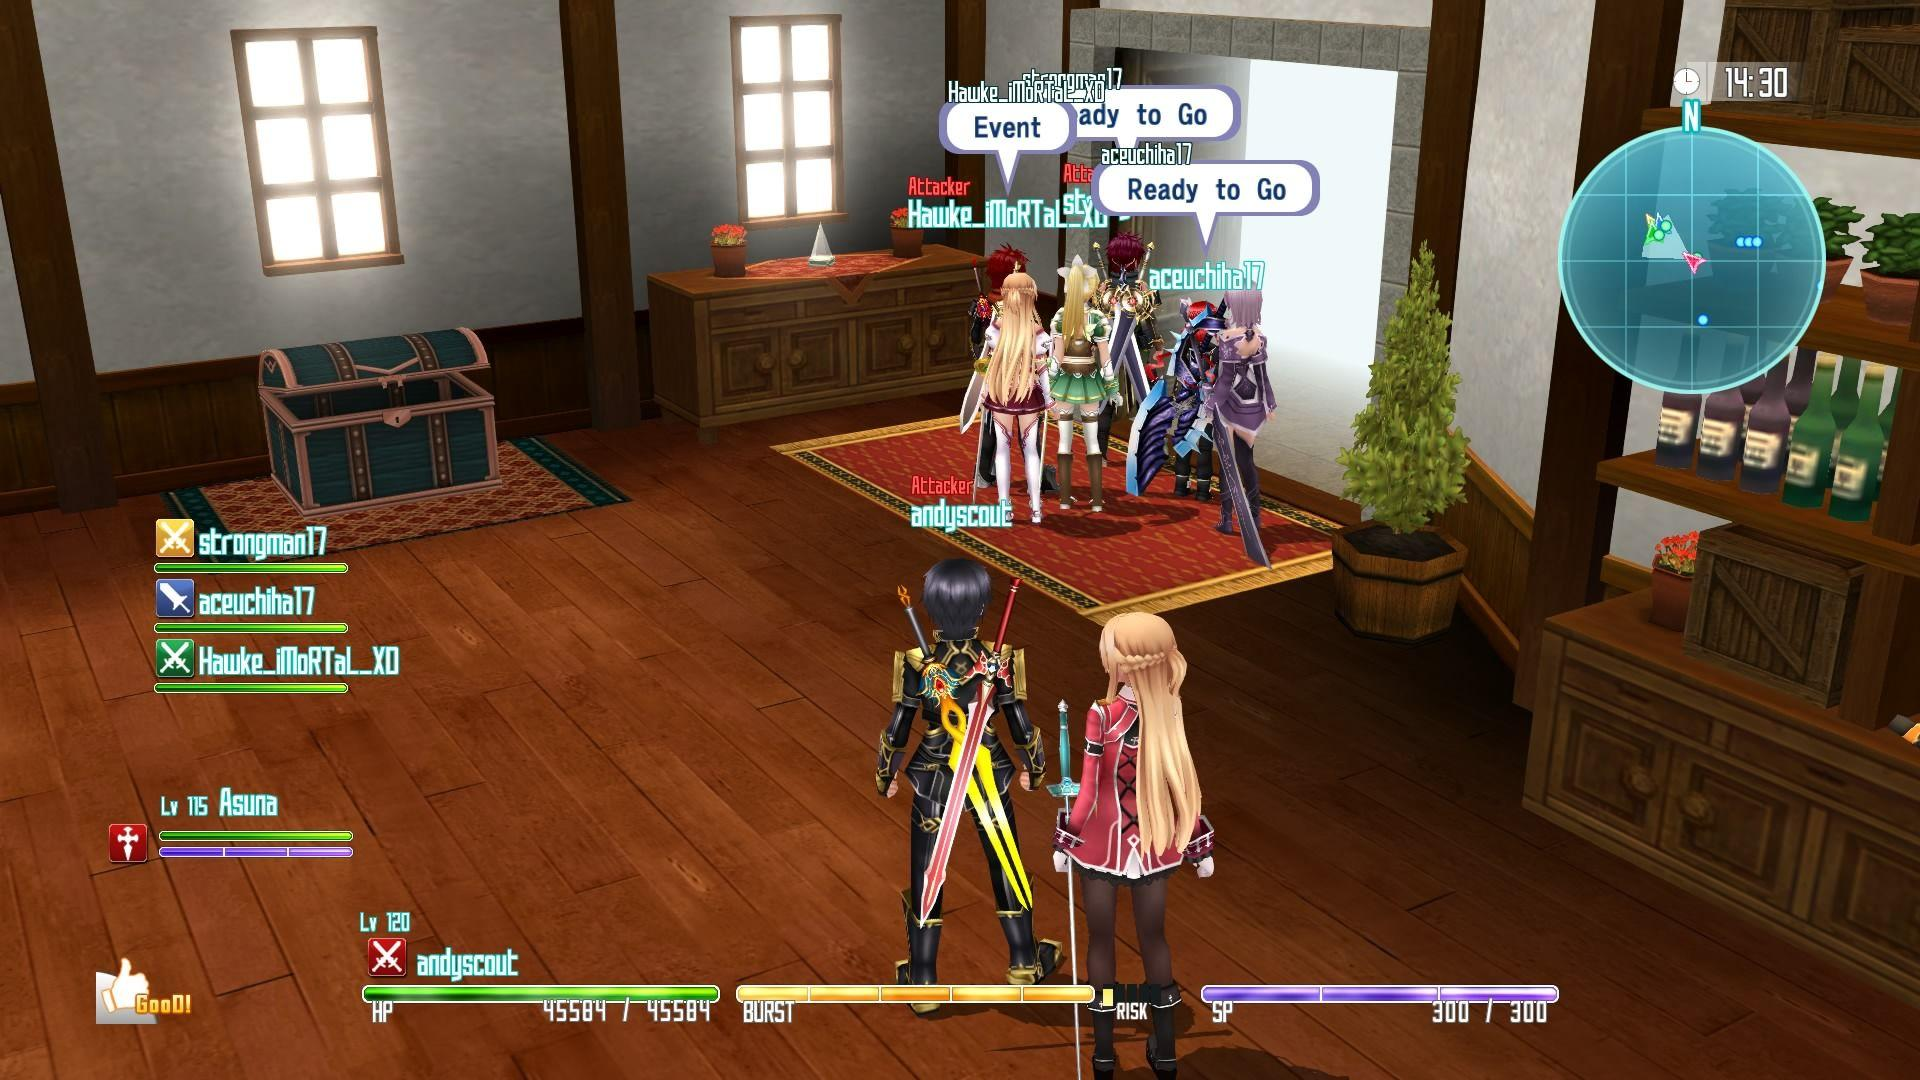 Anime Backgrounds Ps3 Sword Art Online - Wallpaper Cave